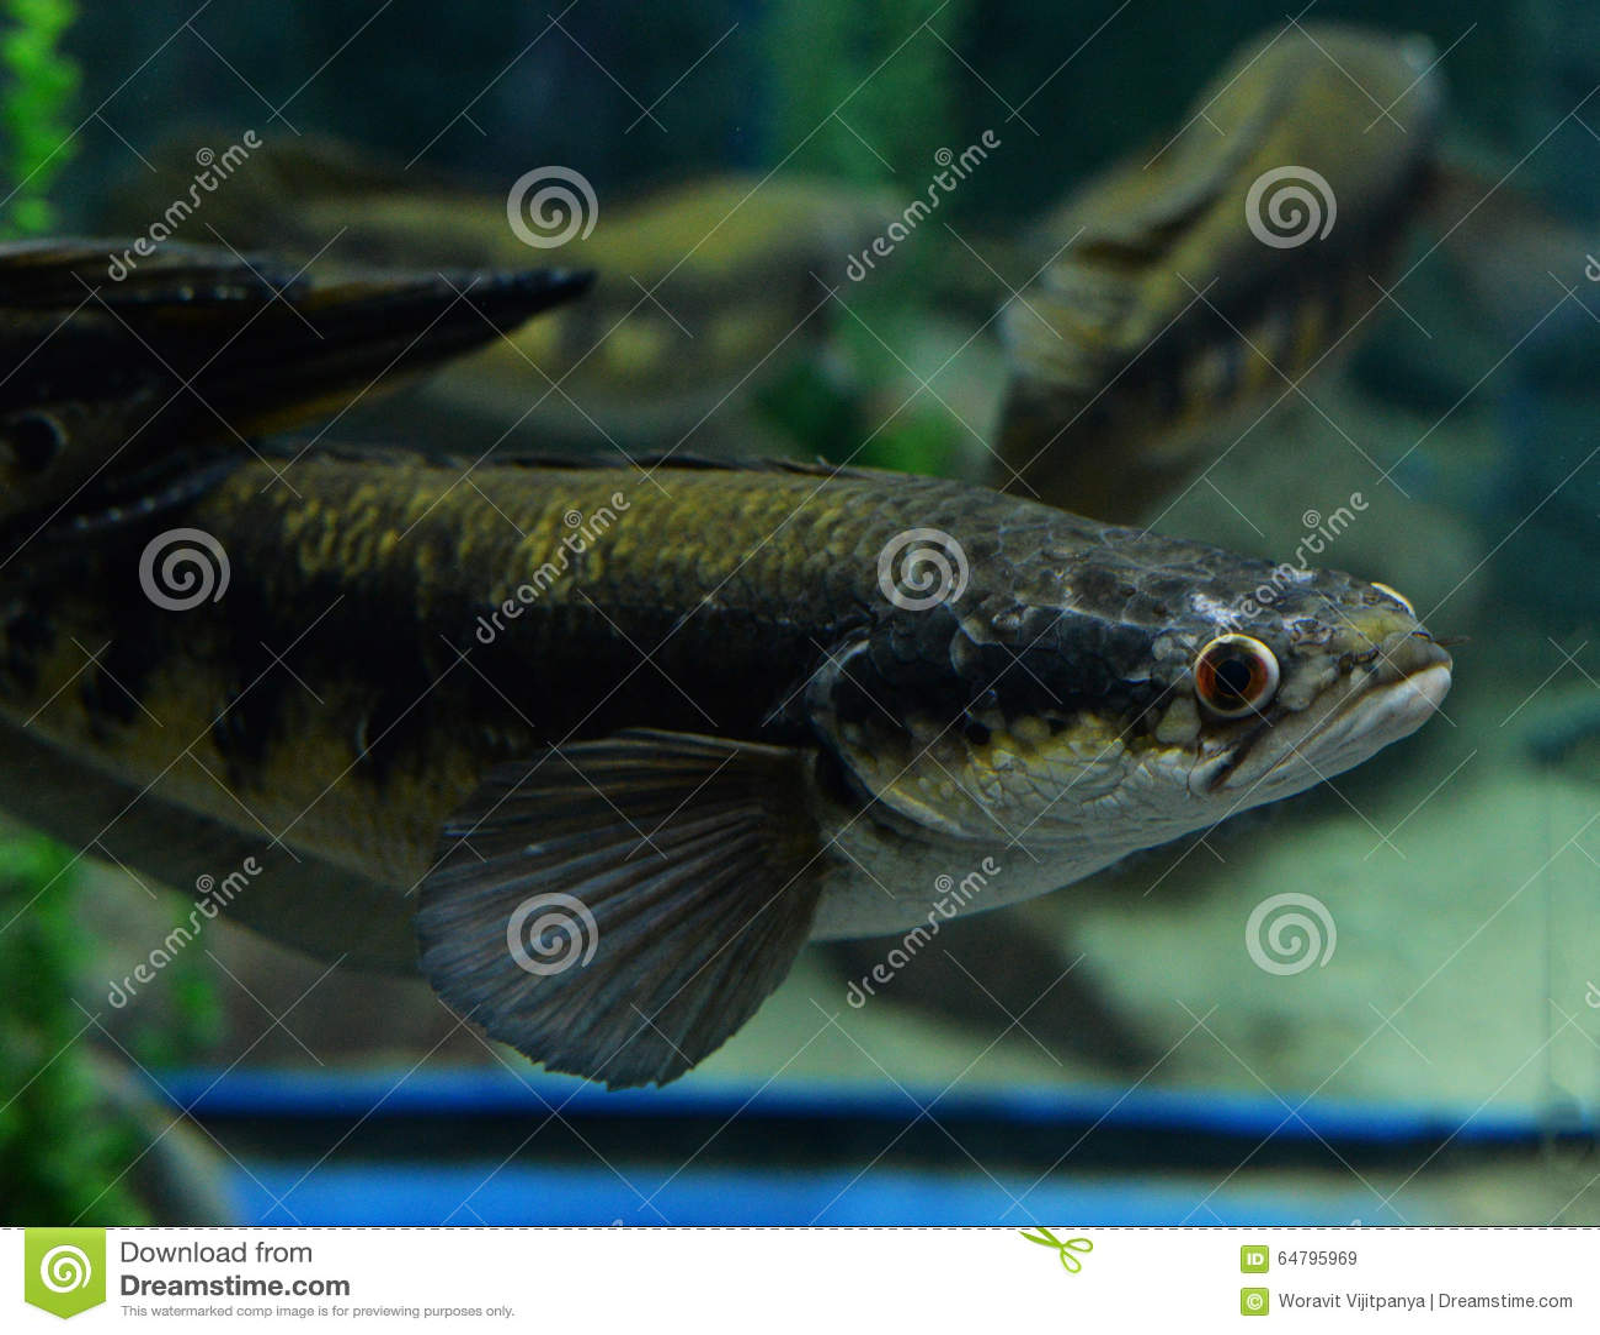 Emperor Snake Head Fish Stock Image Image Of Beautiful 64795969